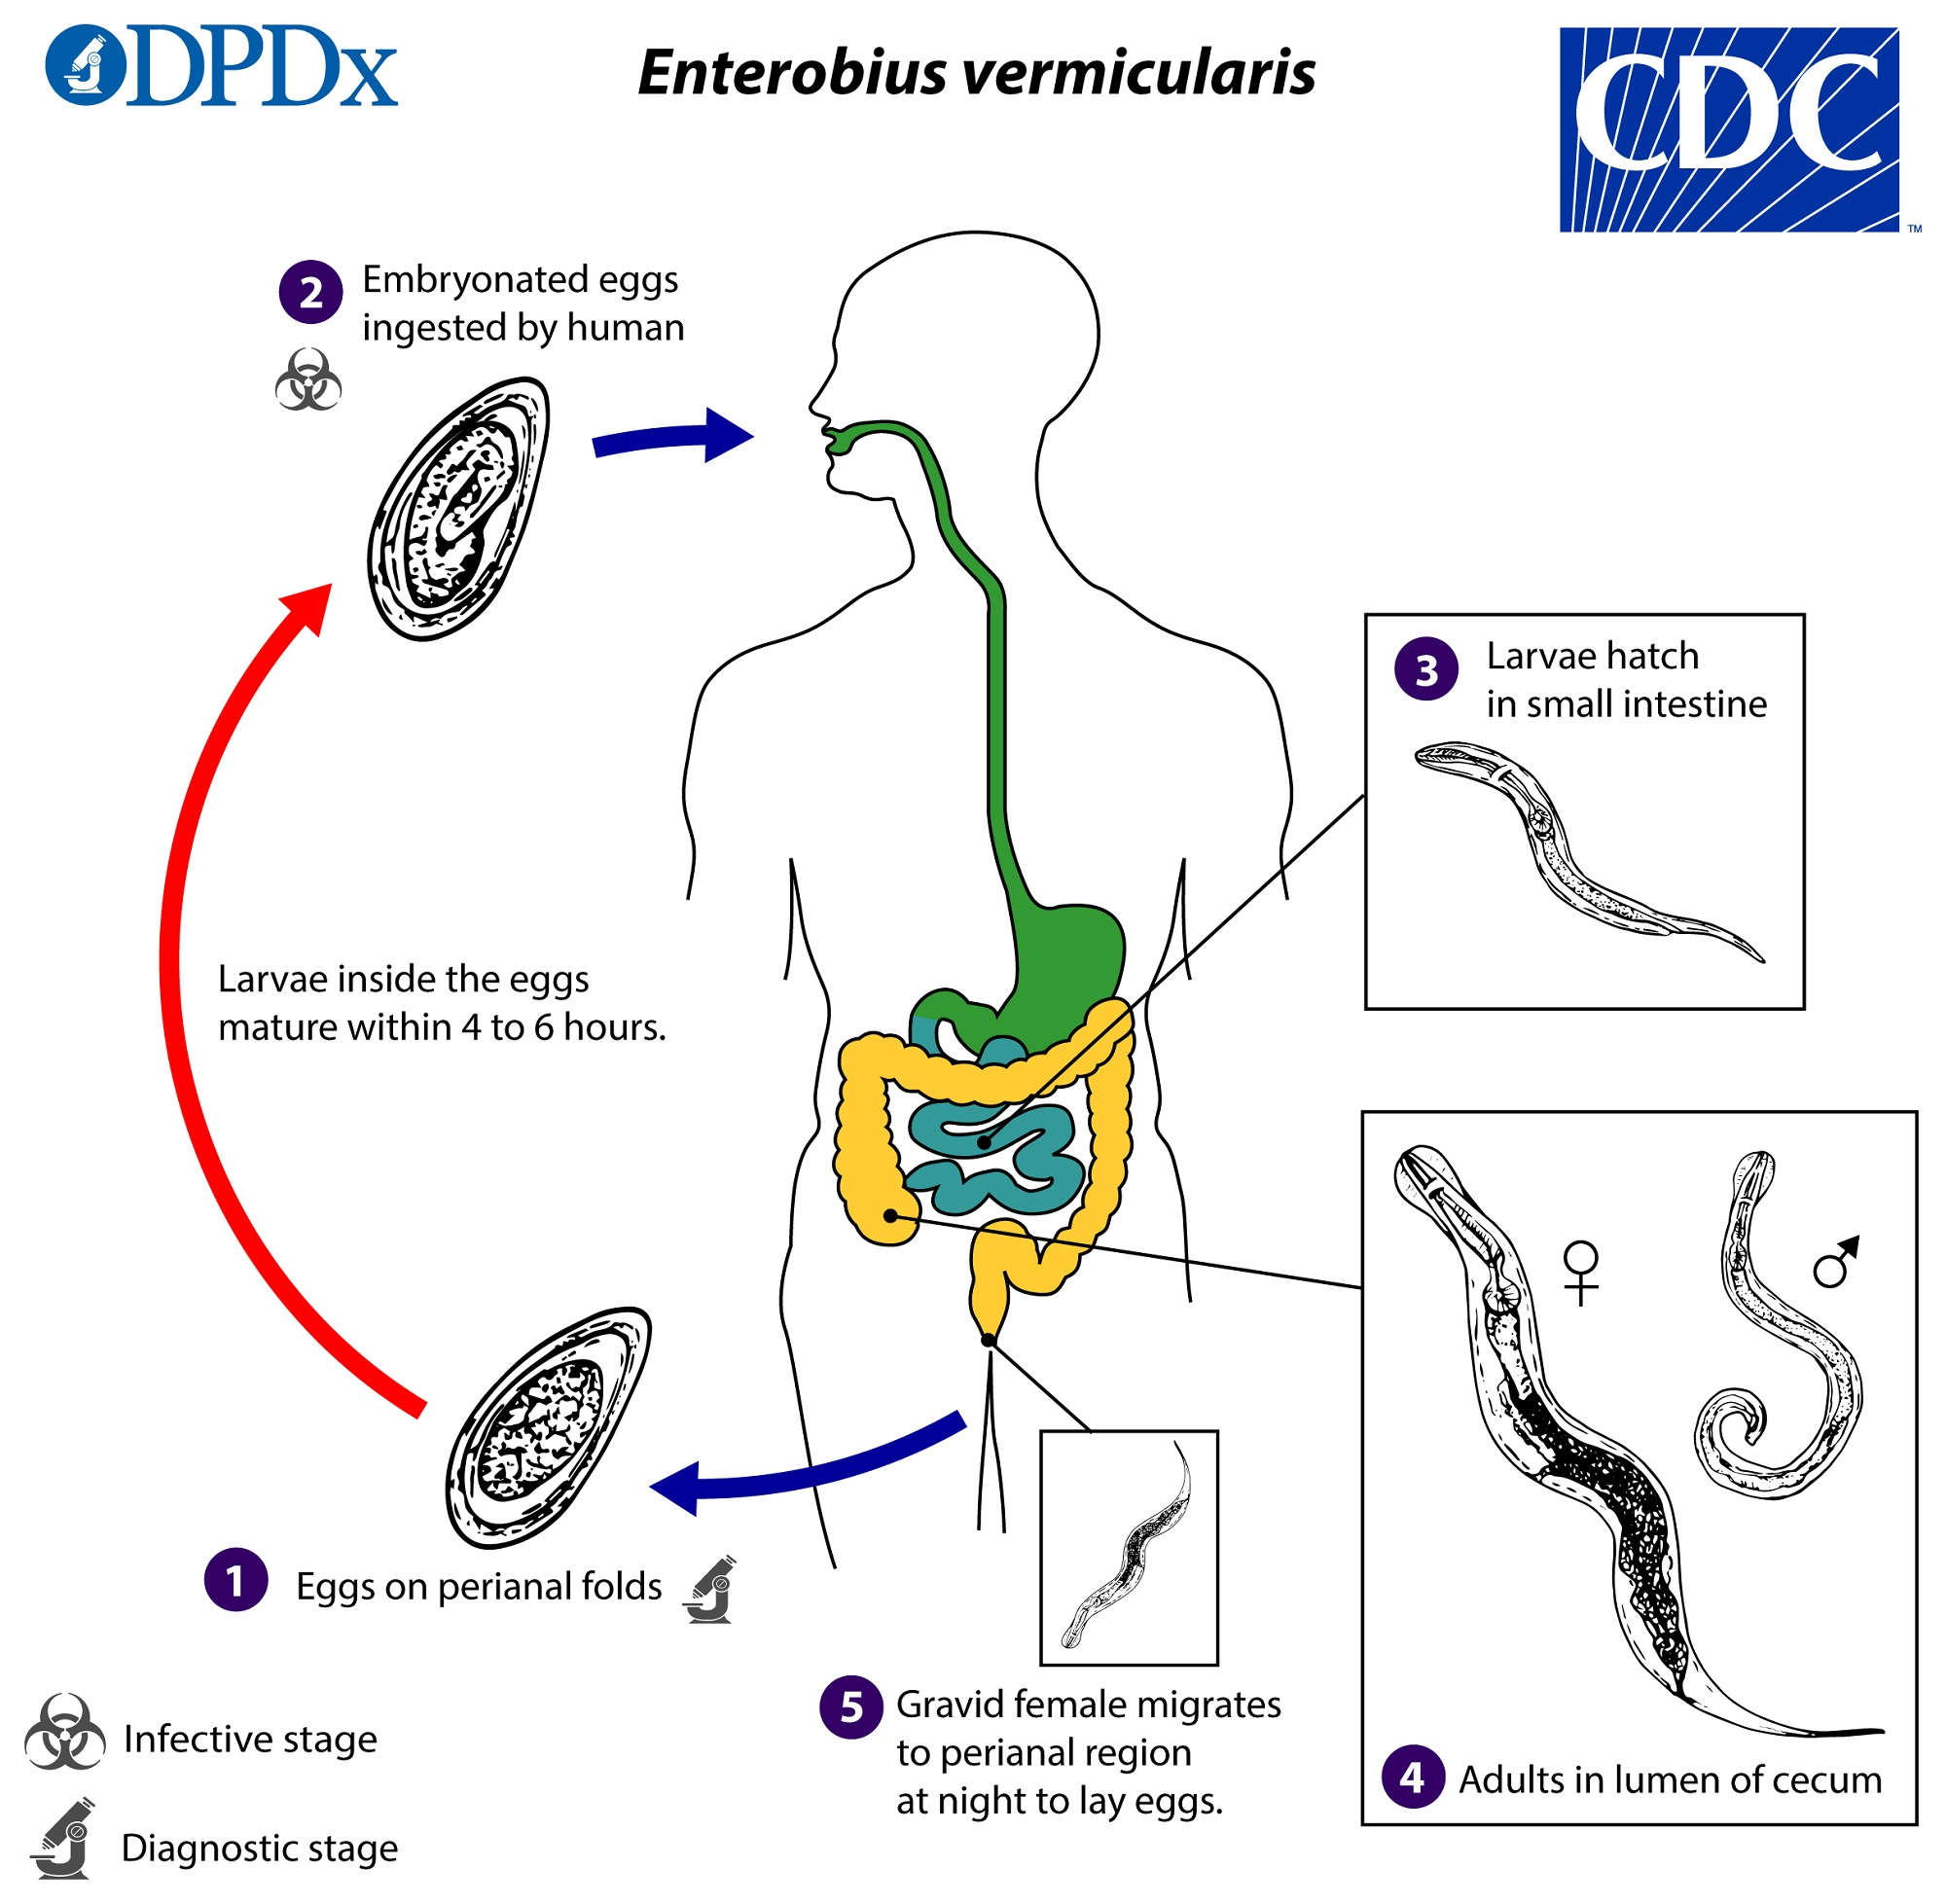 oxiuri mancarimi helmintox uses